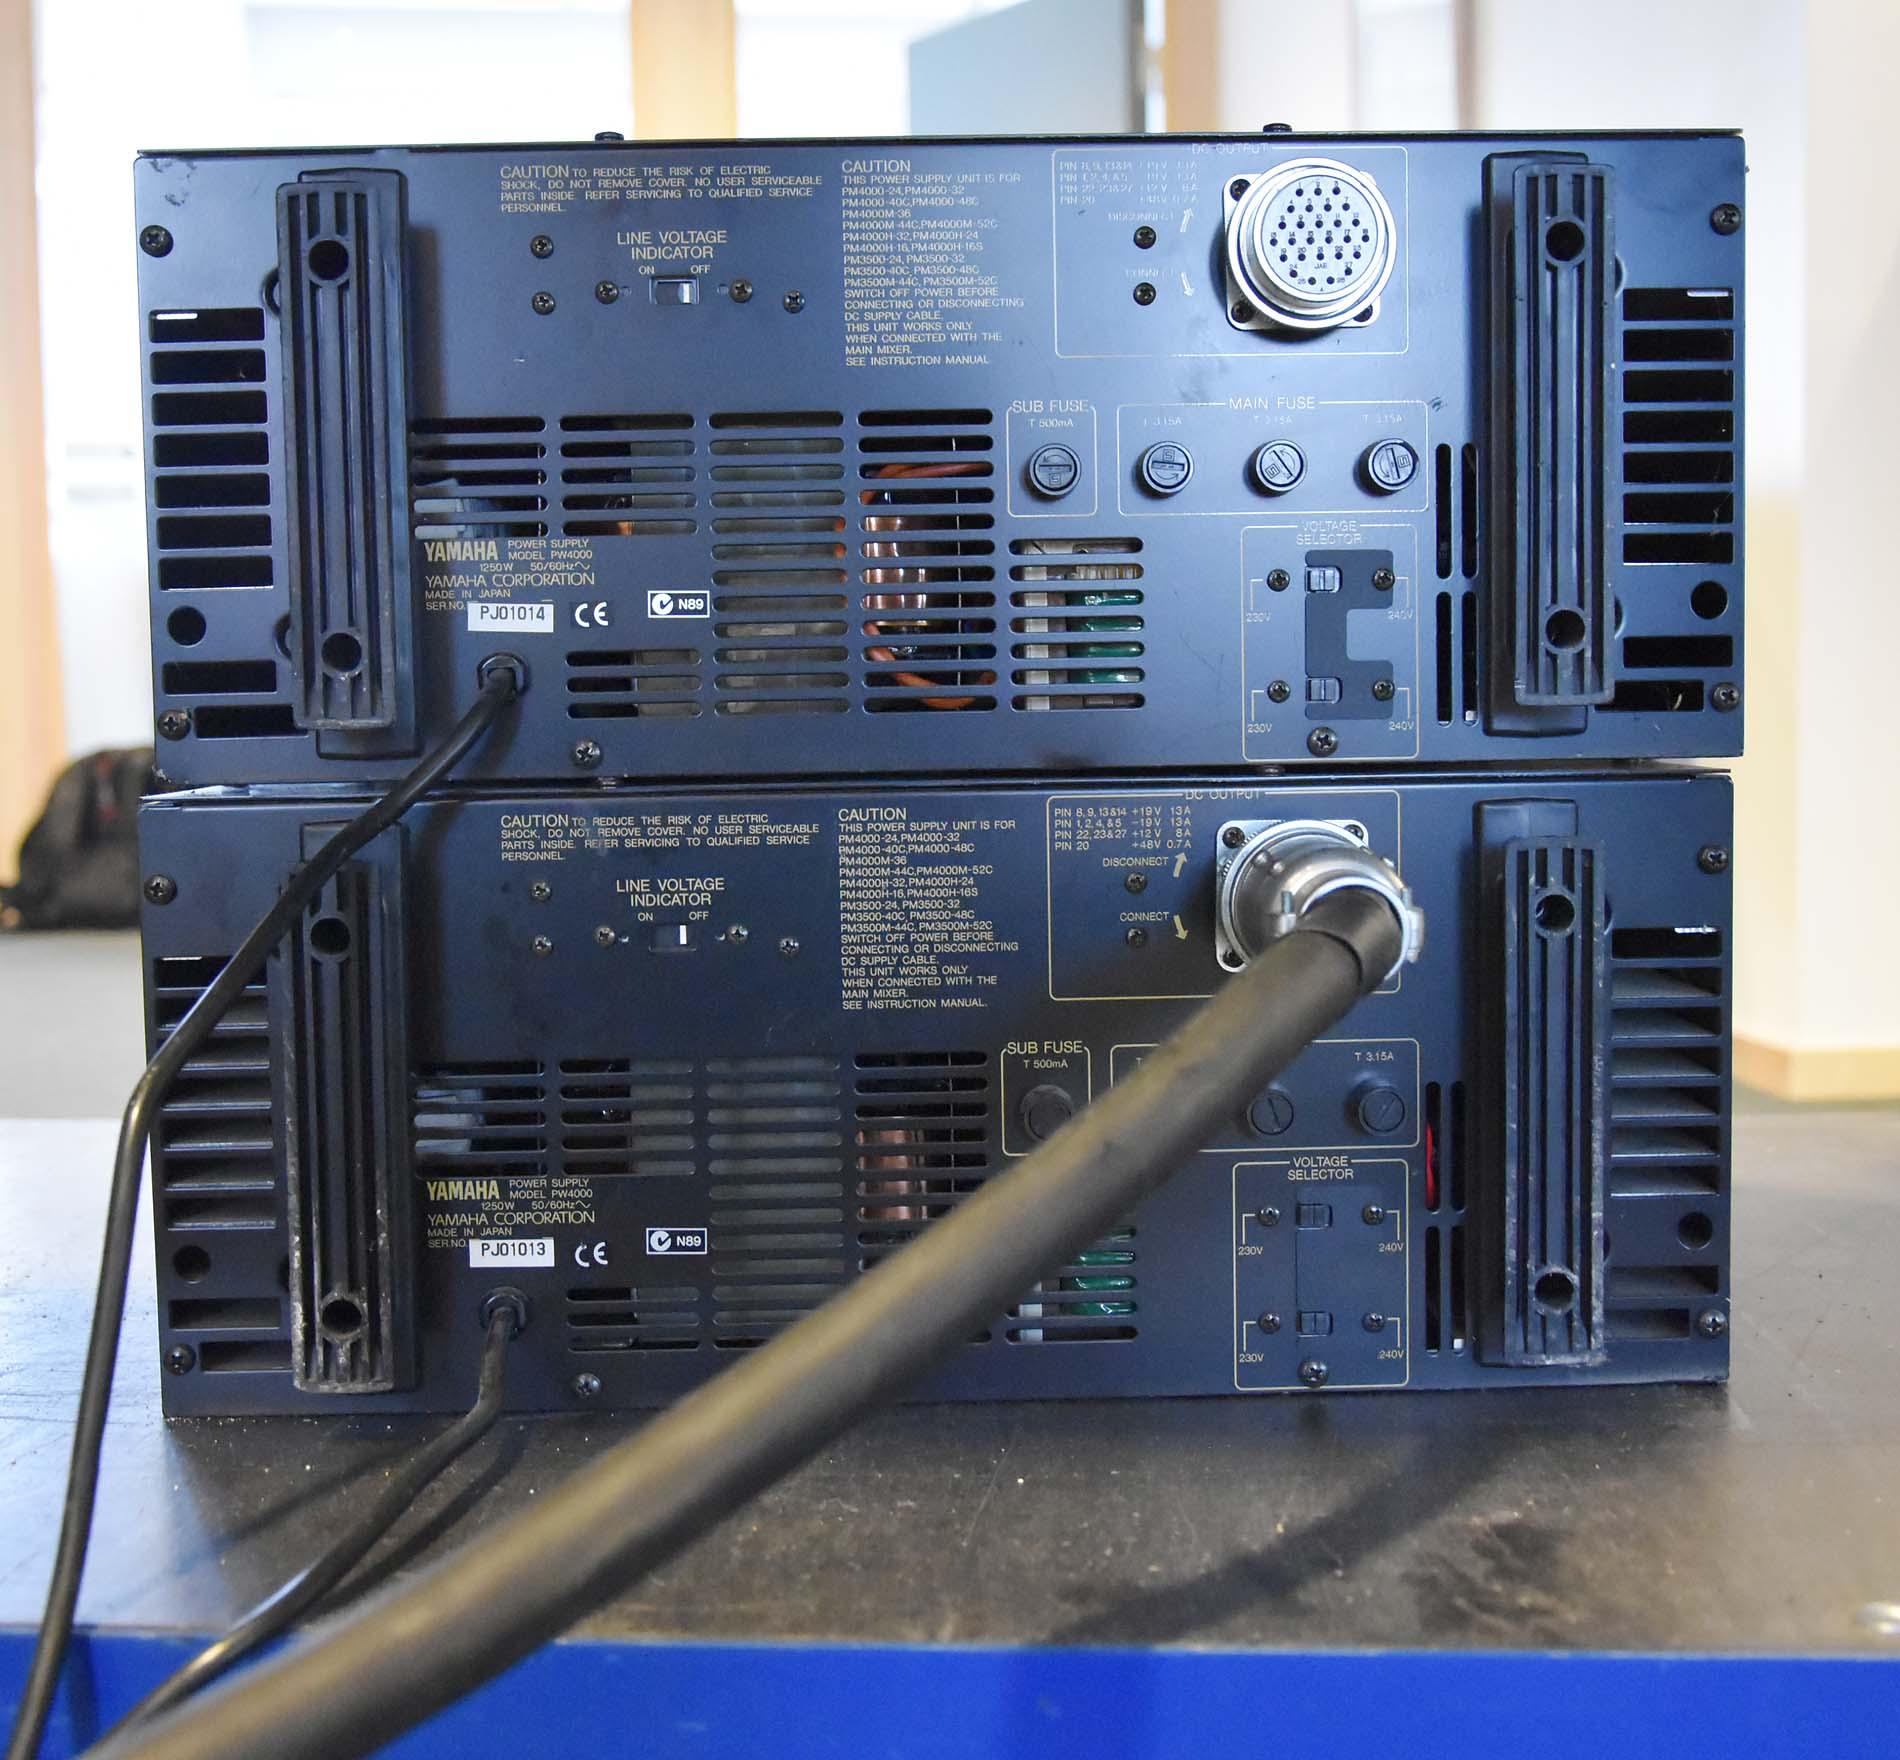 Yamaha PM3500-52 Mixing Console